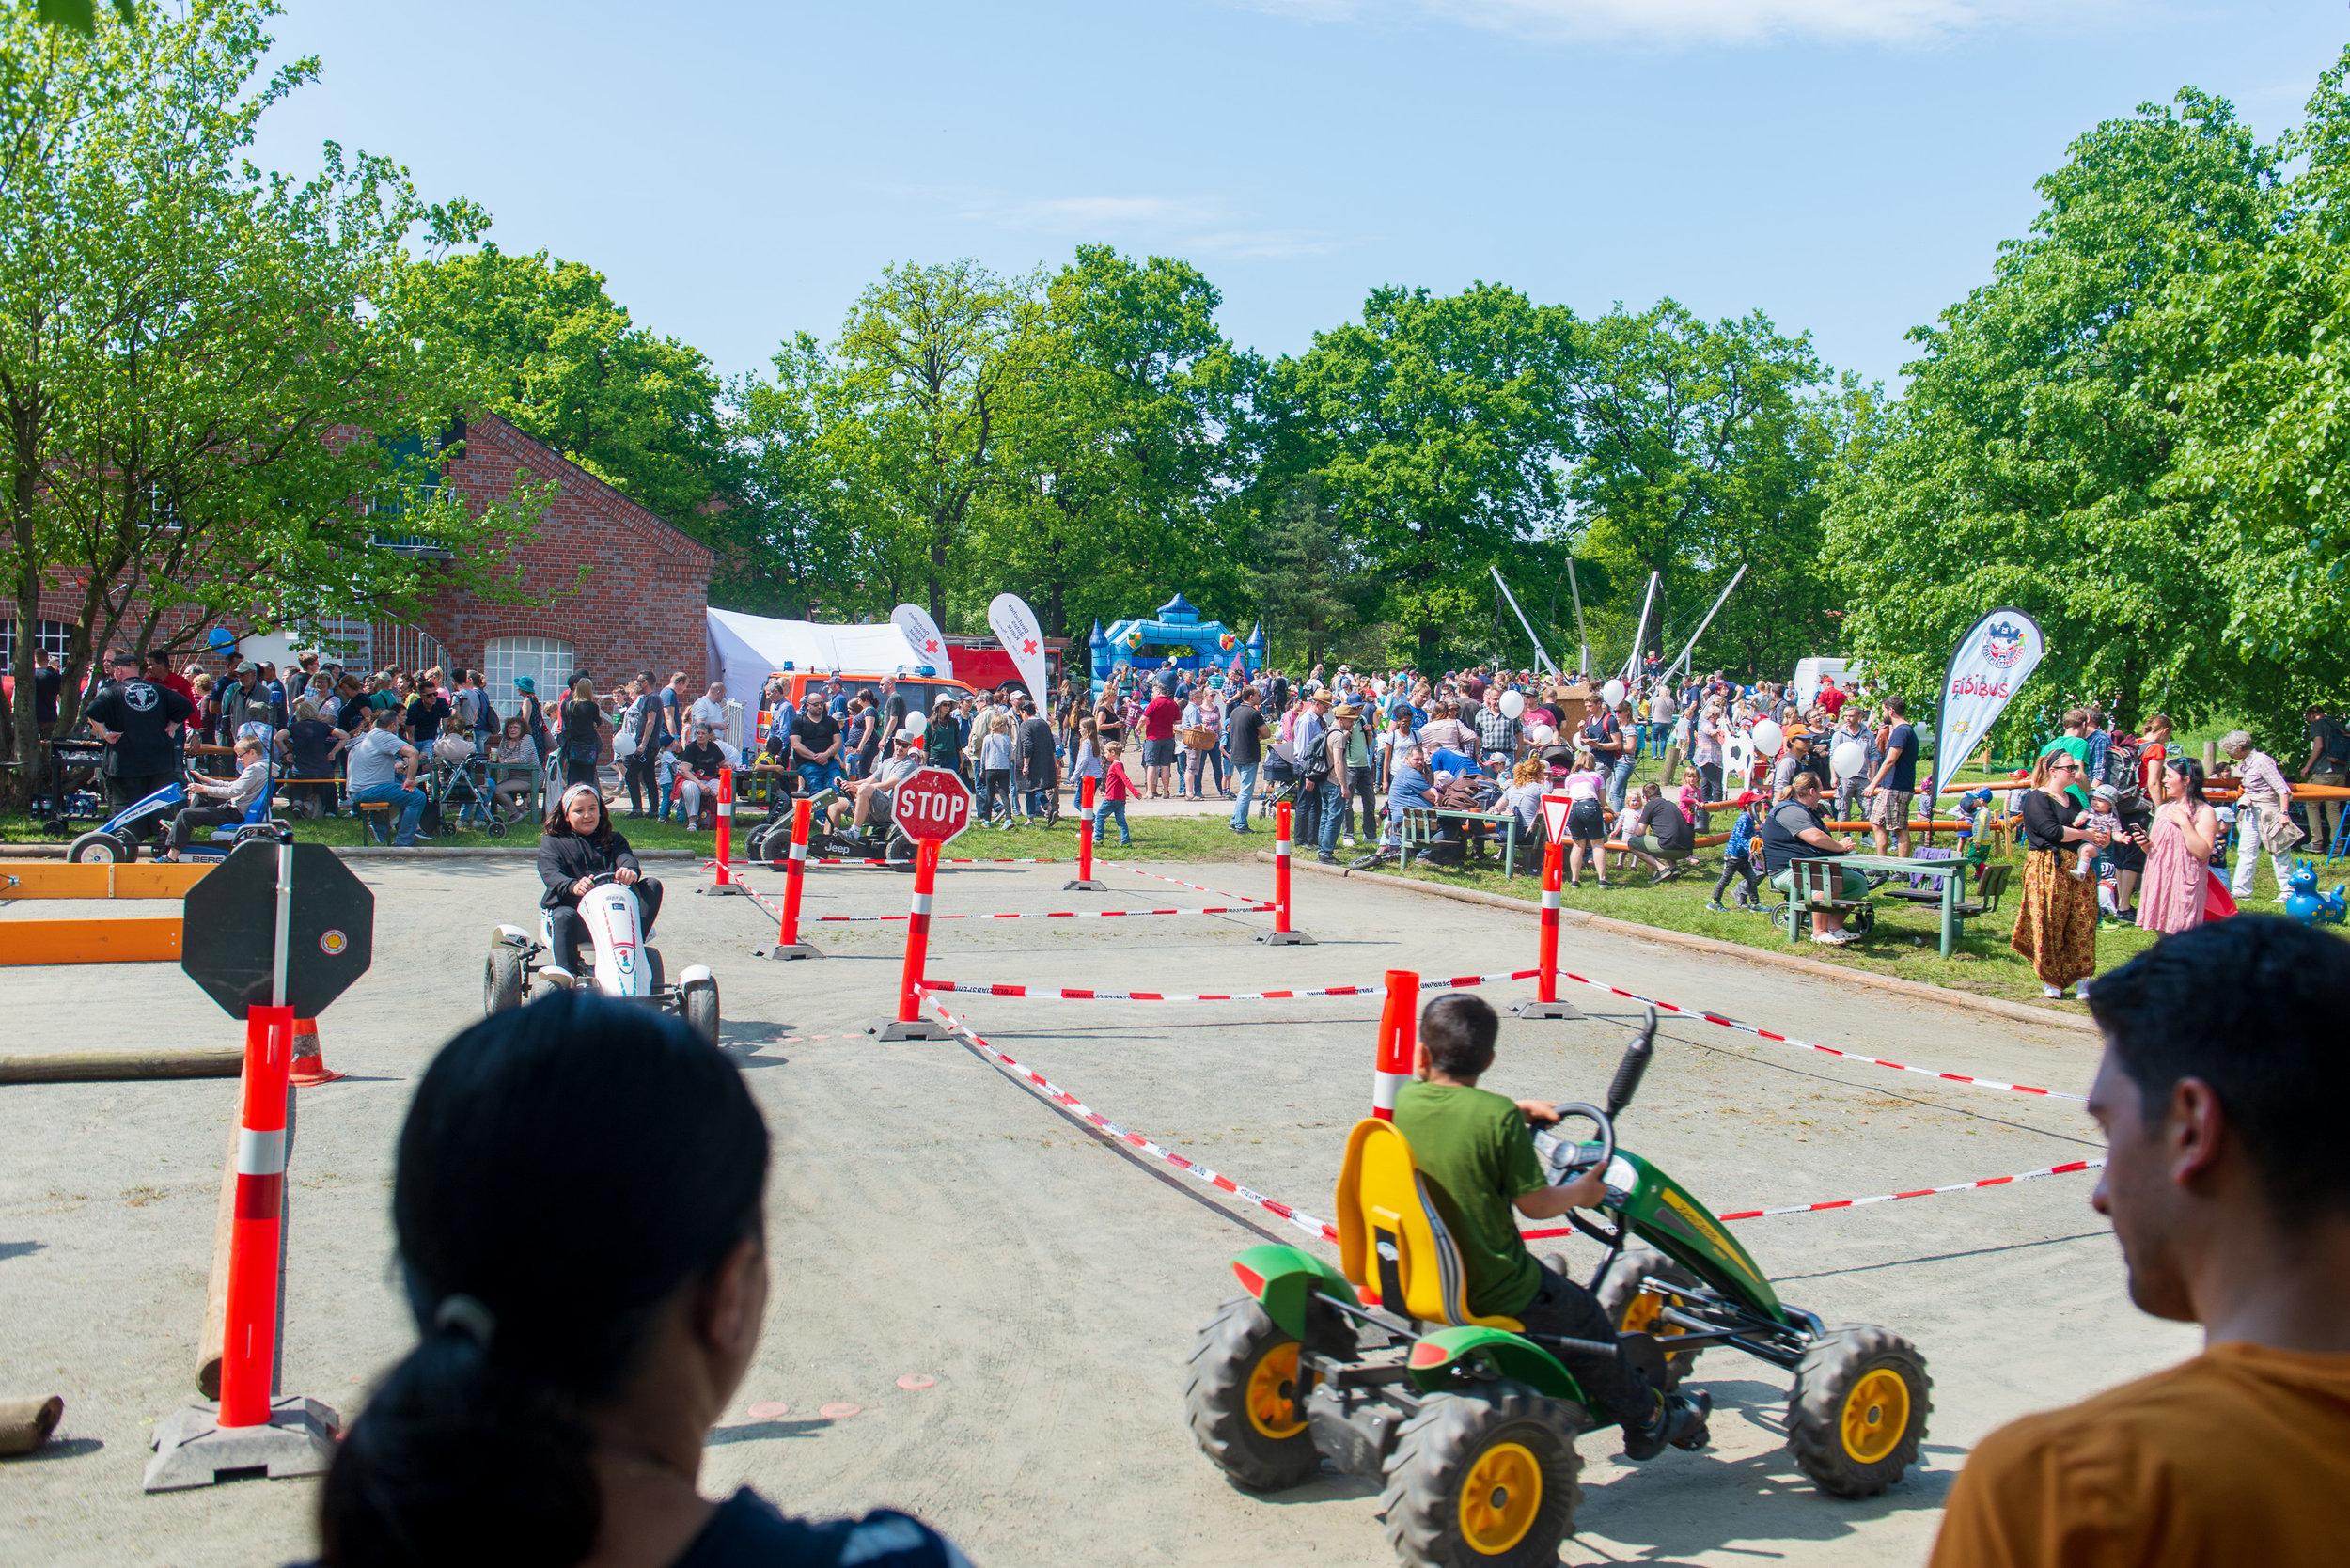 13-Norderstedter-Museumsfest-2019-FWM--XO-Dennys-Mamero-WEB-51.jpg